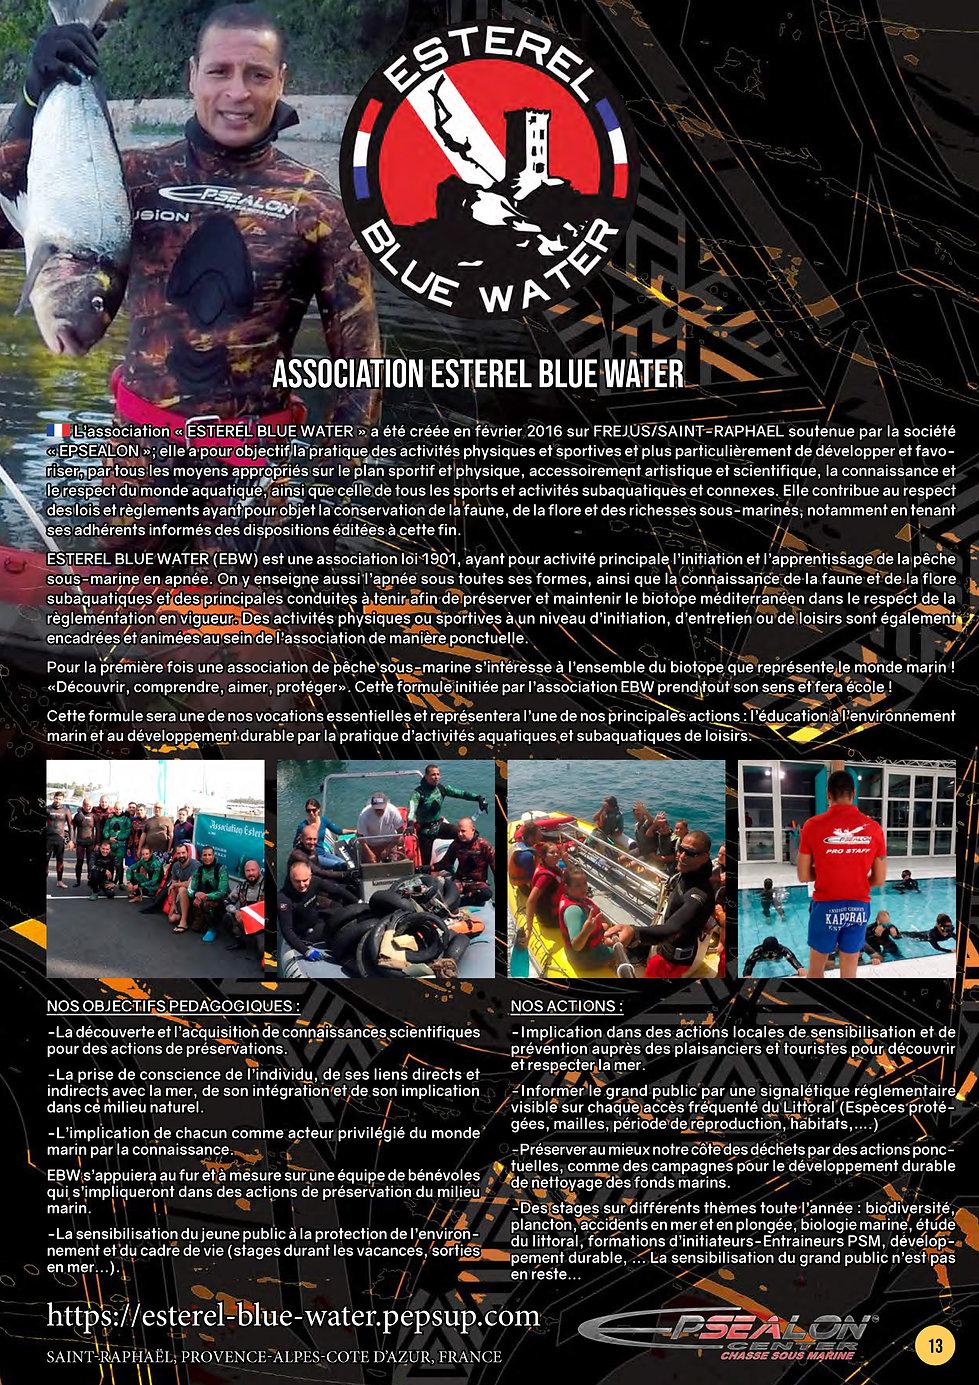 Epsealon-Catalogue2021_Page_013.jpg